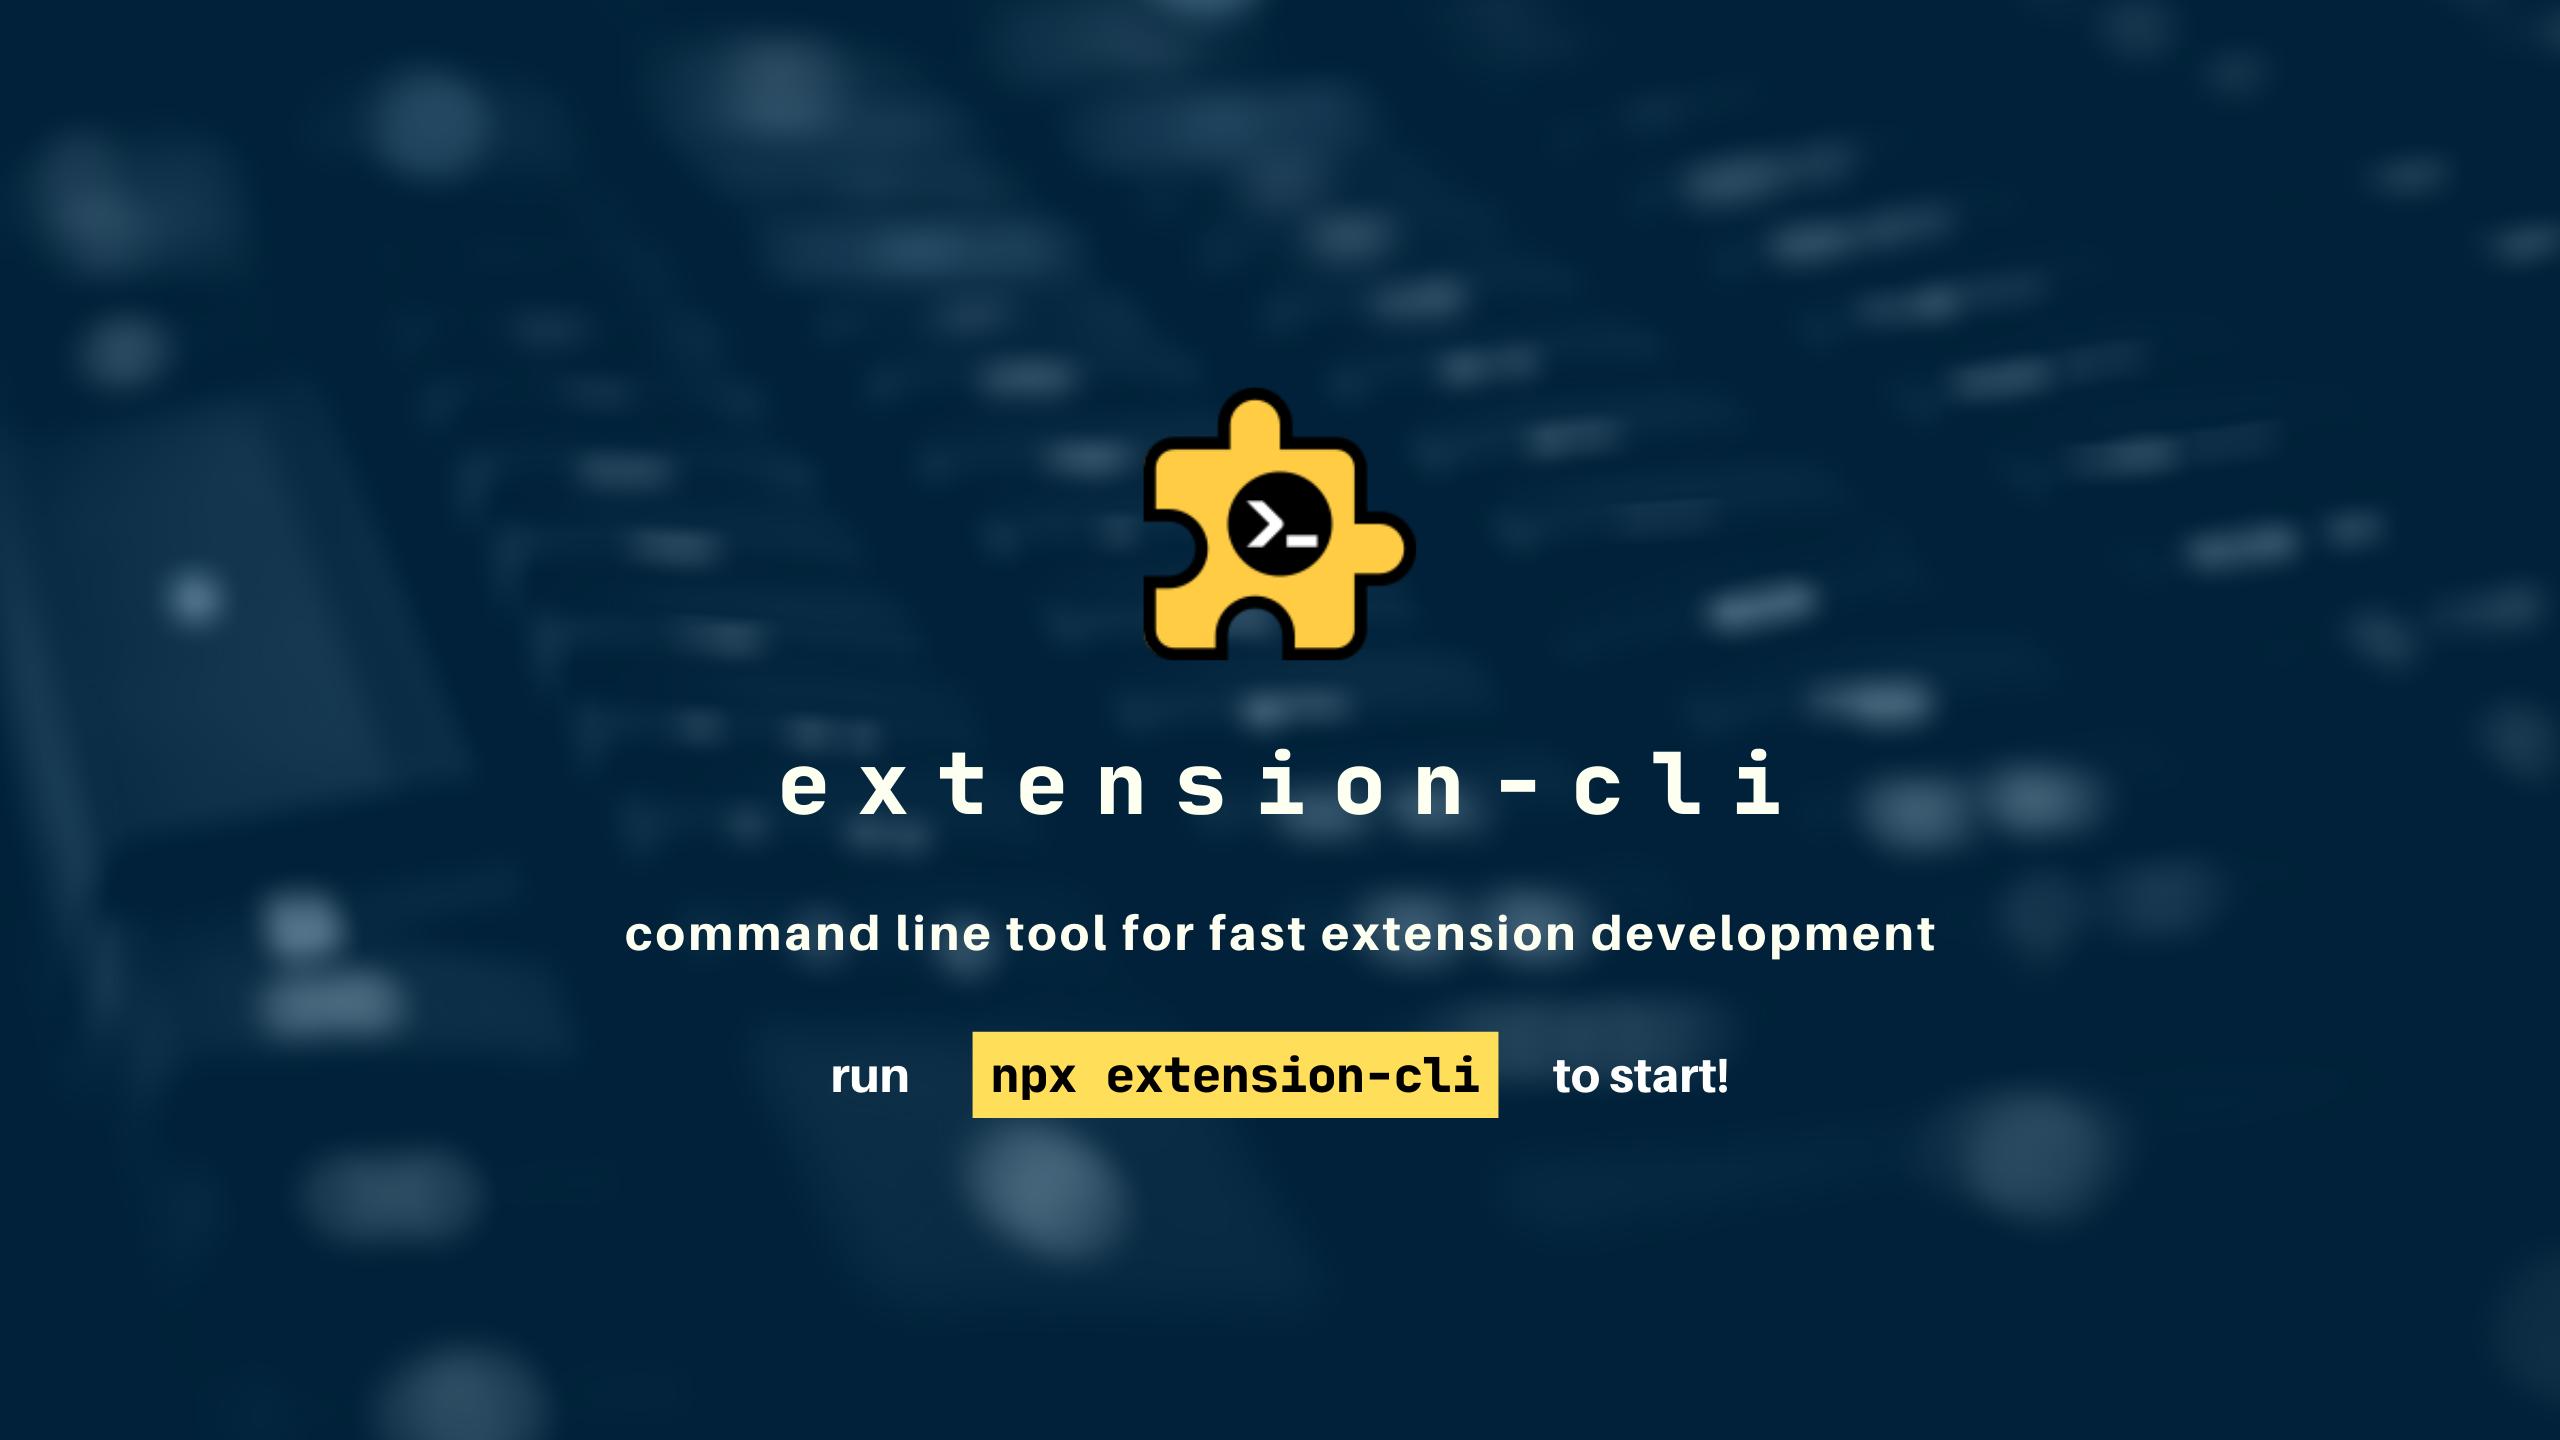 extension-cli